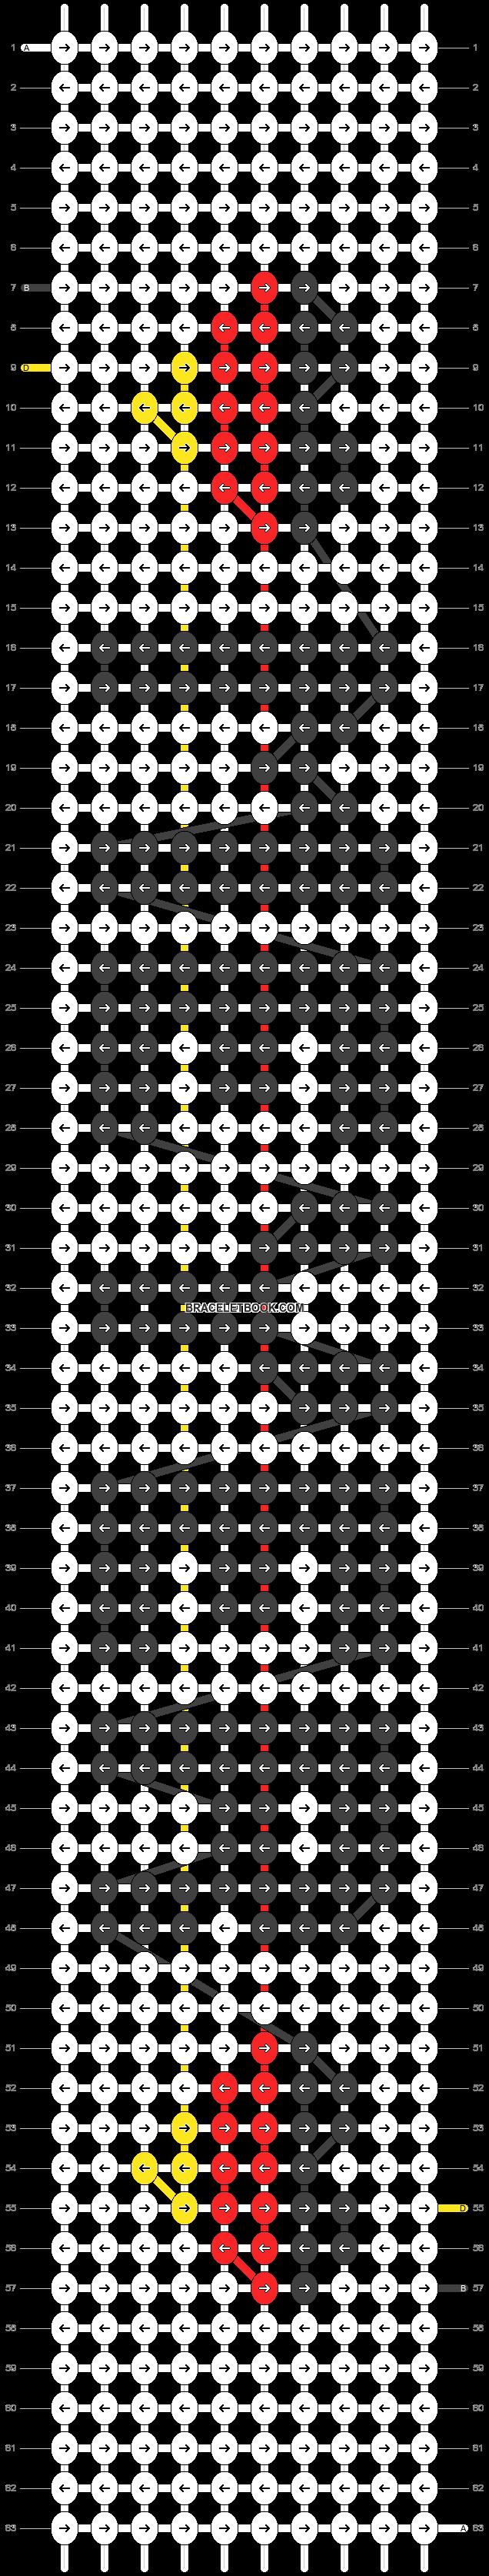 Alpha Pattern #21697 added by Meyer7